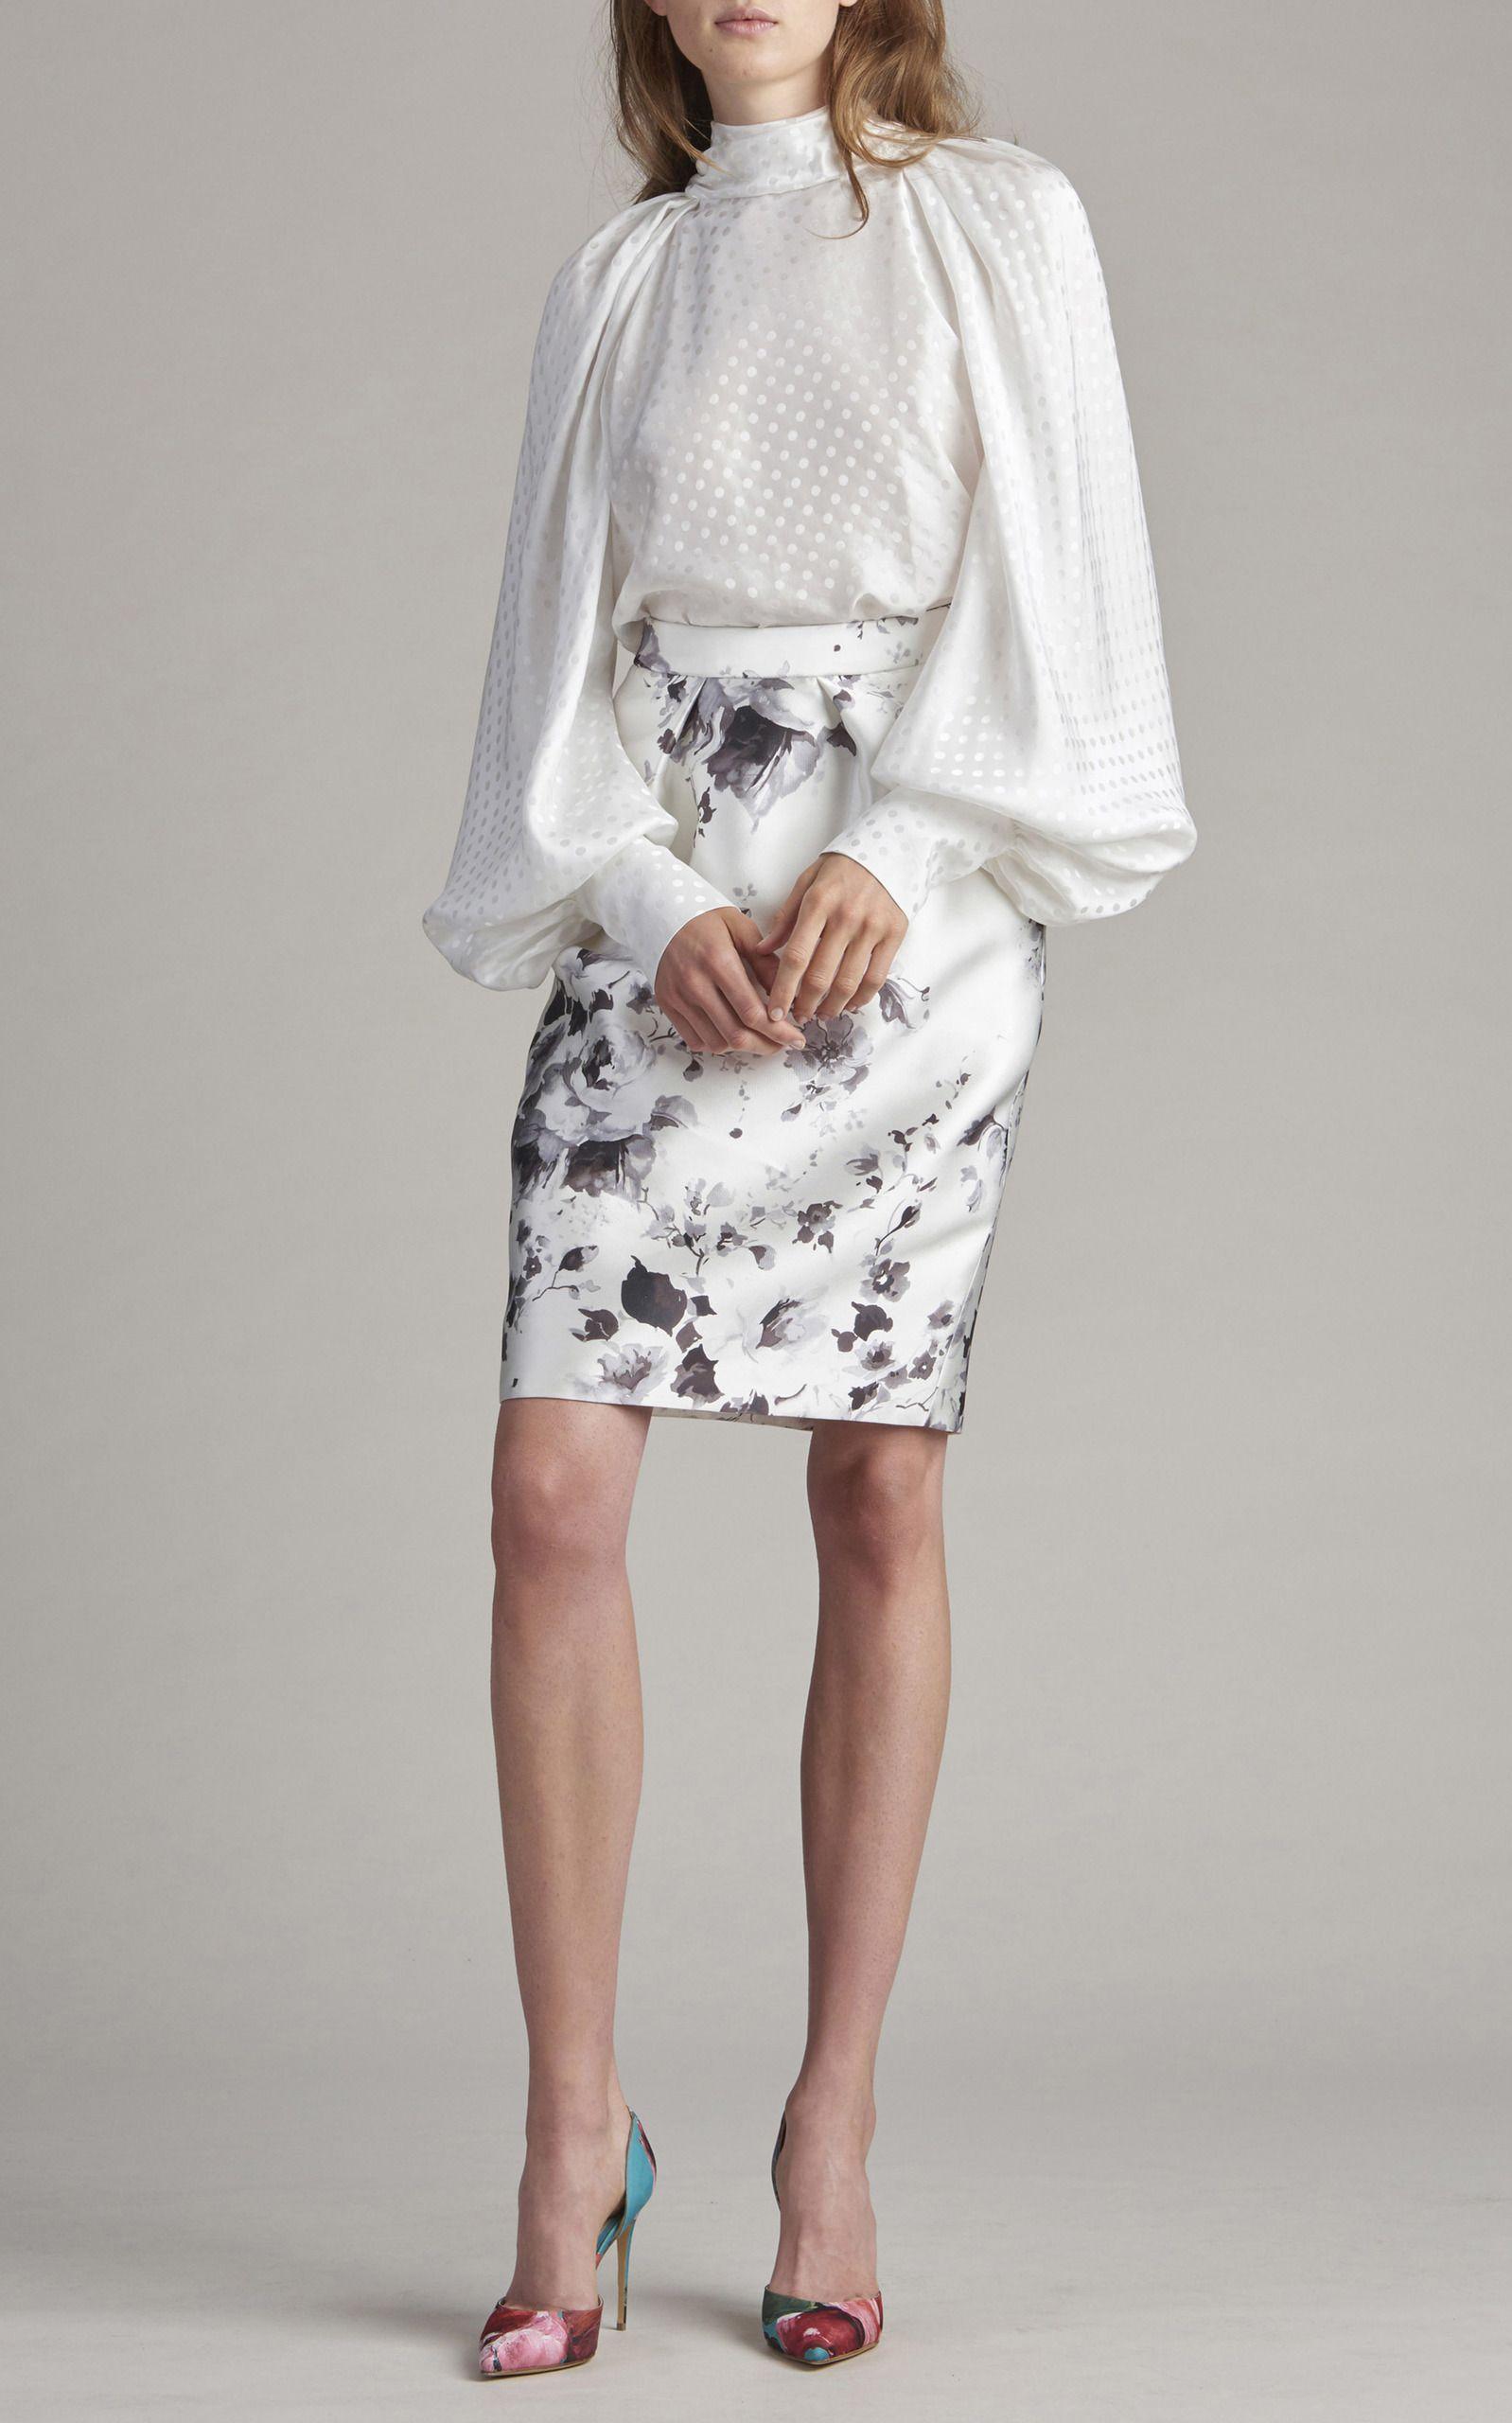 aa4d8839ad Long Silk Skirt, Long Pencil Skirt, Printed Pencil Skirt, Floral Print Skirt ,